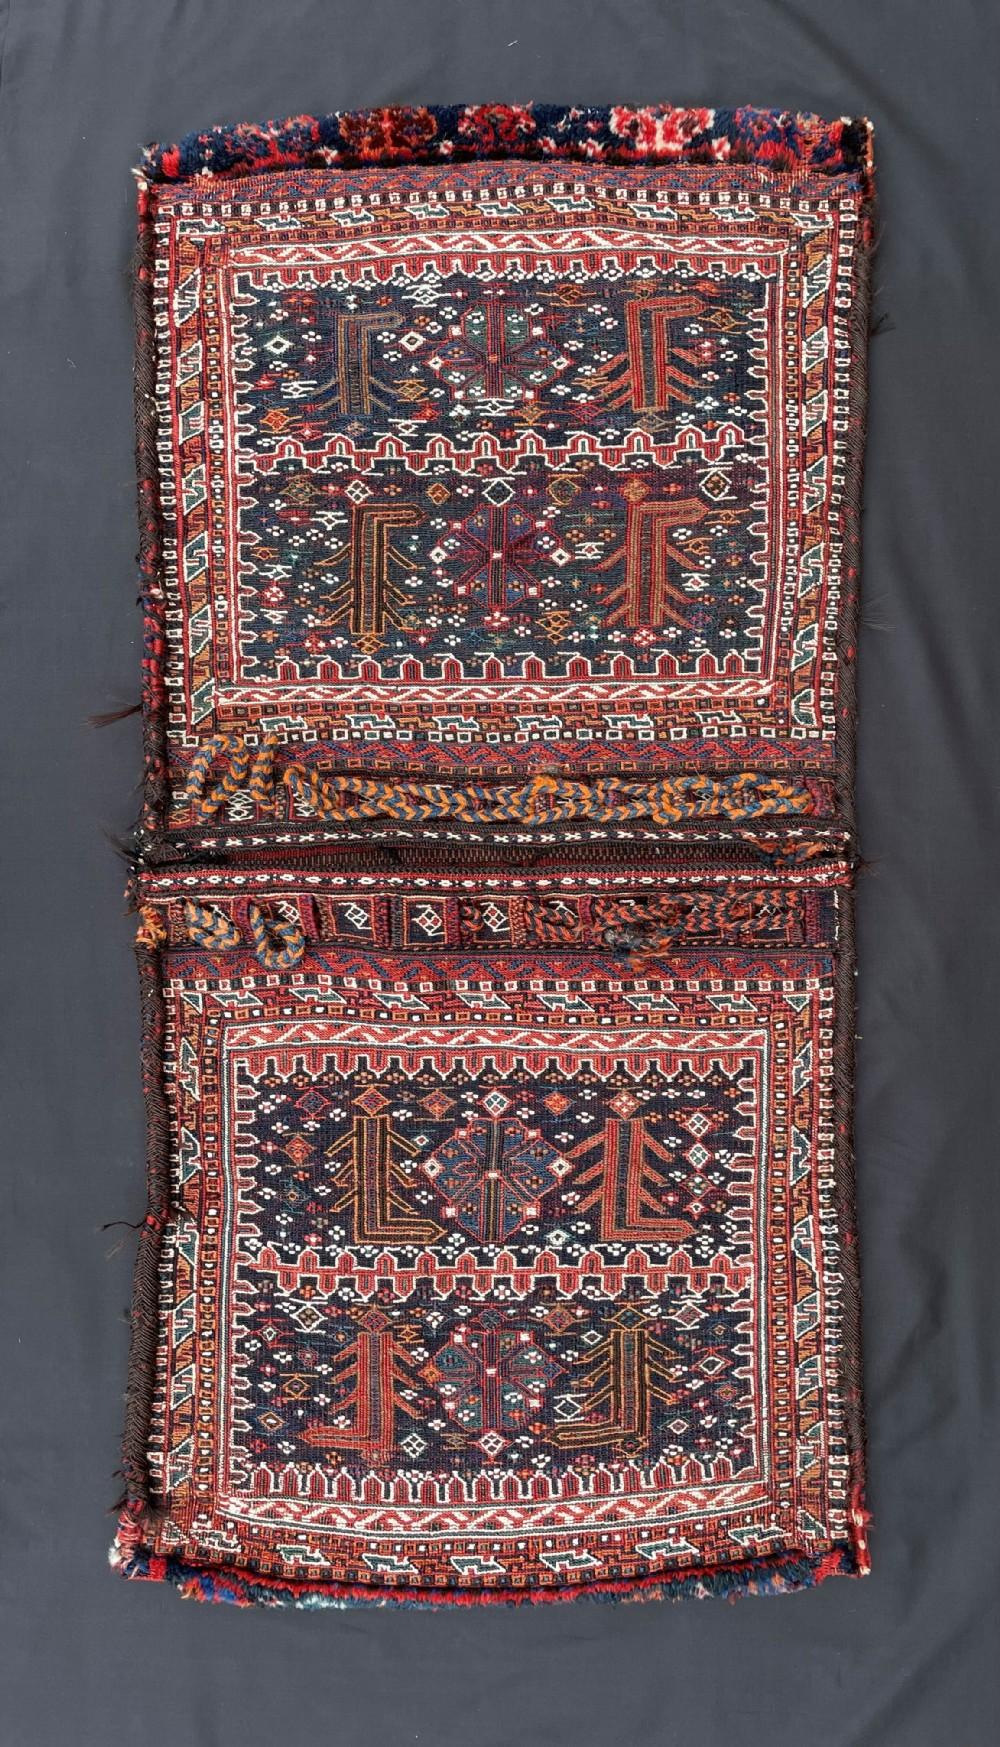 antique khorjin saddlebags bakhtiari tribes the chahar mahal region western persia